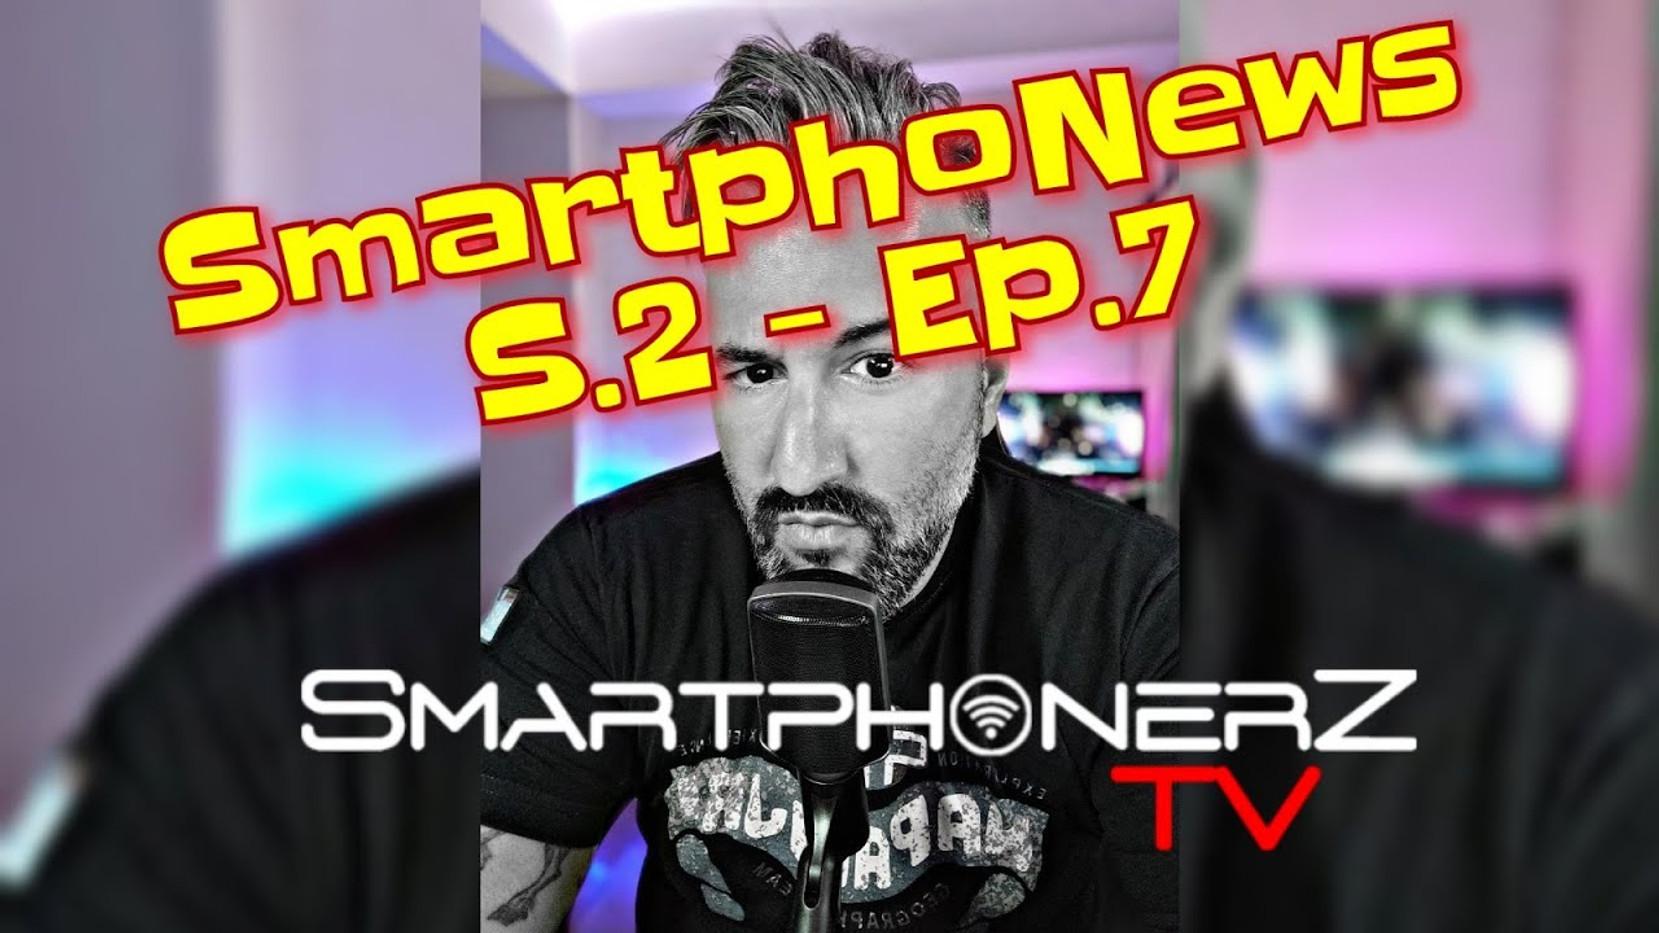 SmartphoNews S.2 - Ep.7